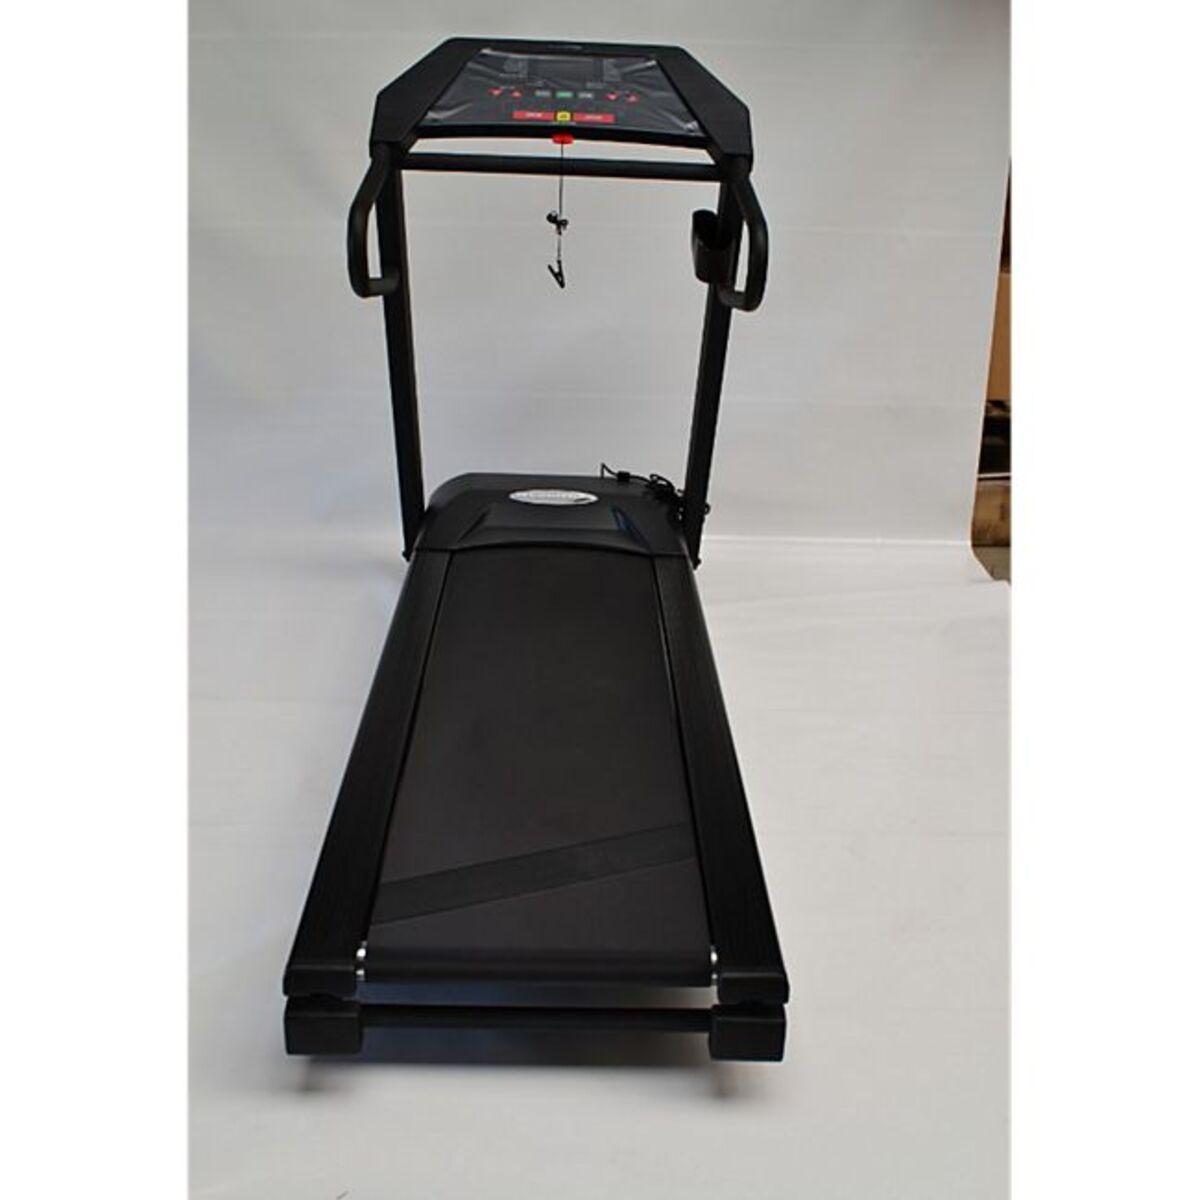 Bild 1 von Steelflex Treadmill XT-6800 Laufband